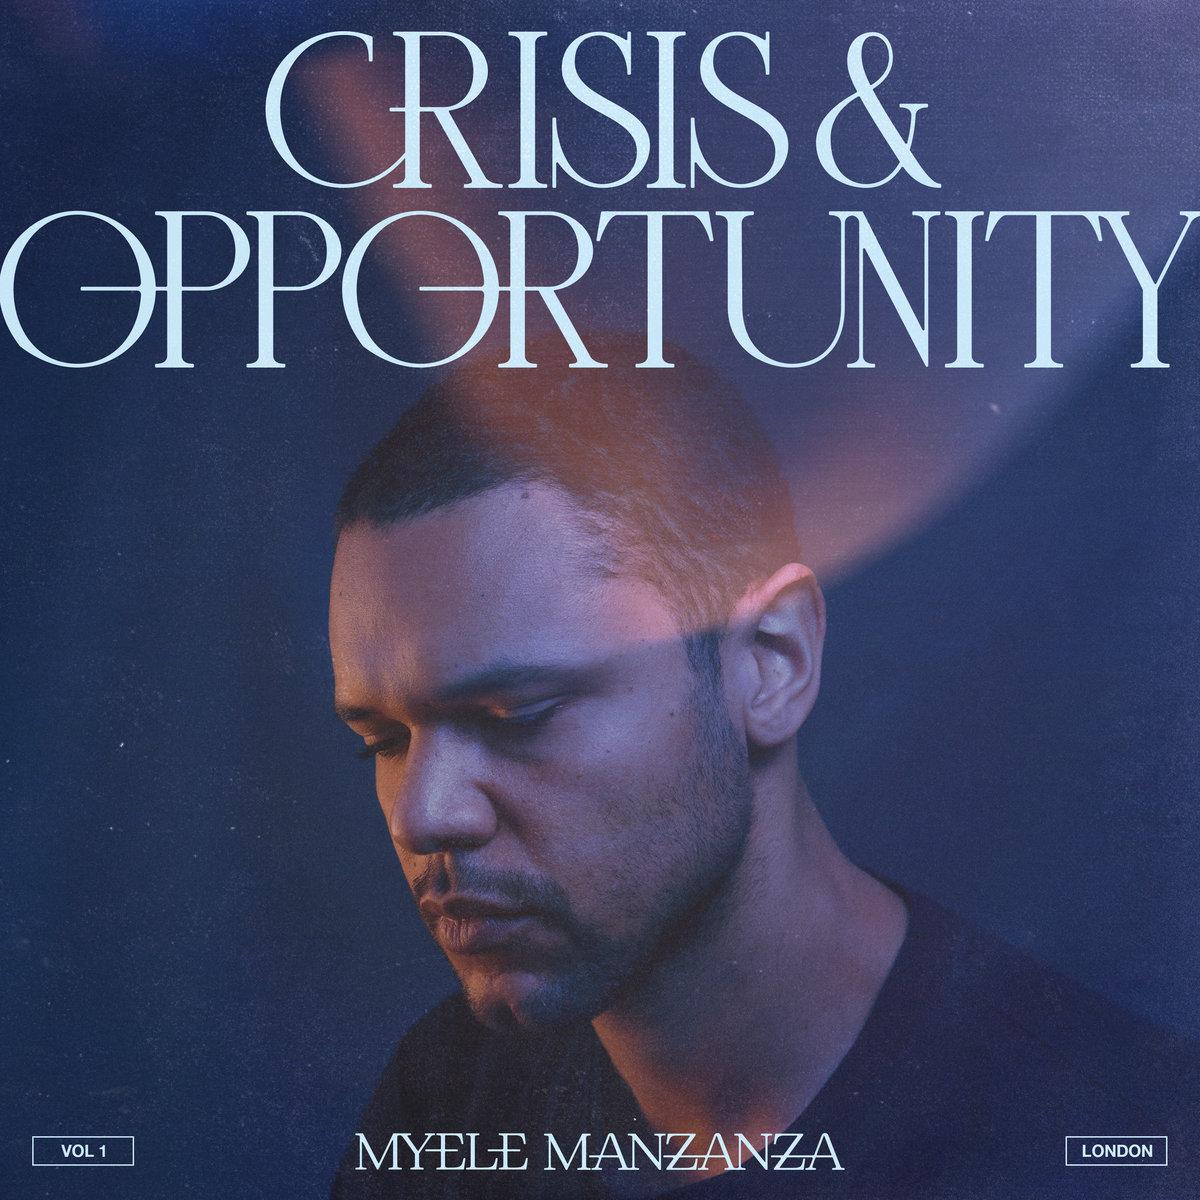 "Myele Manzanza ""Crisis & Opportunity Vol. 1"